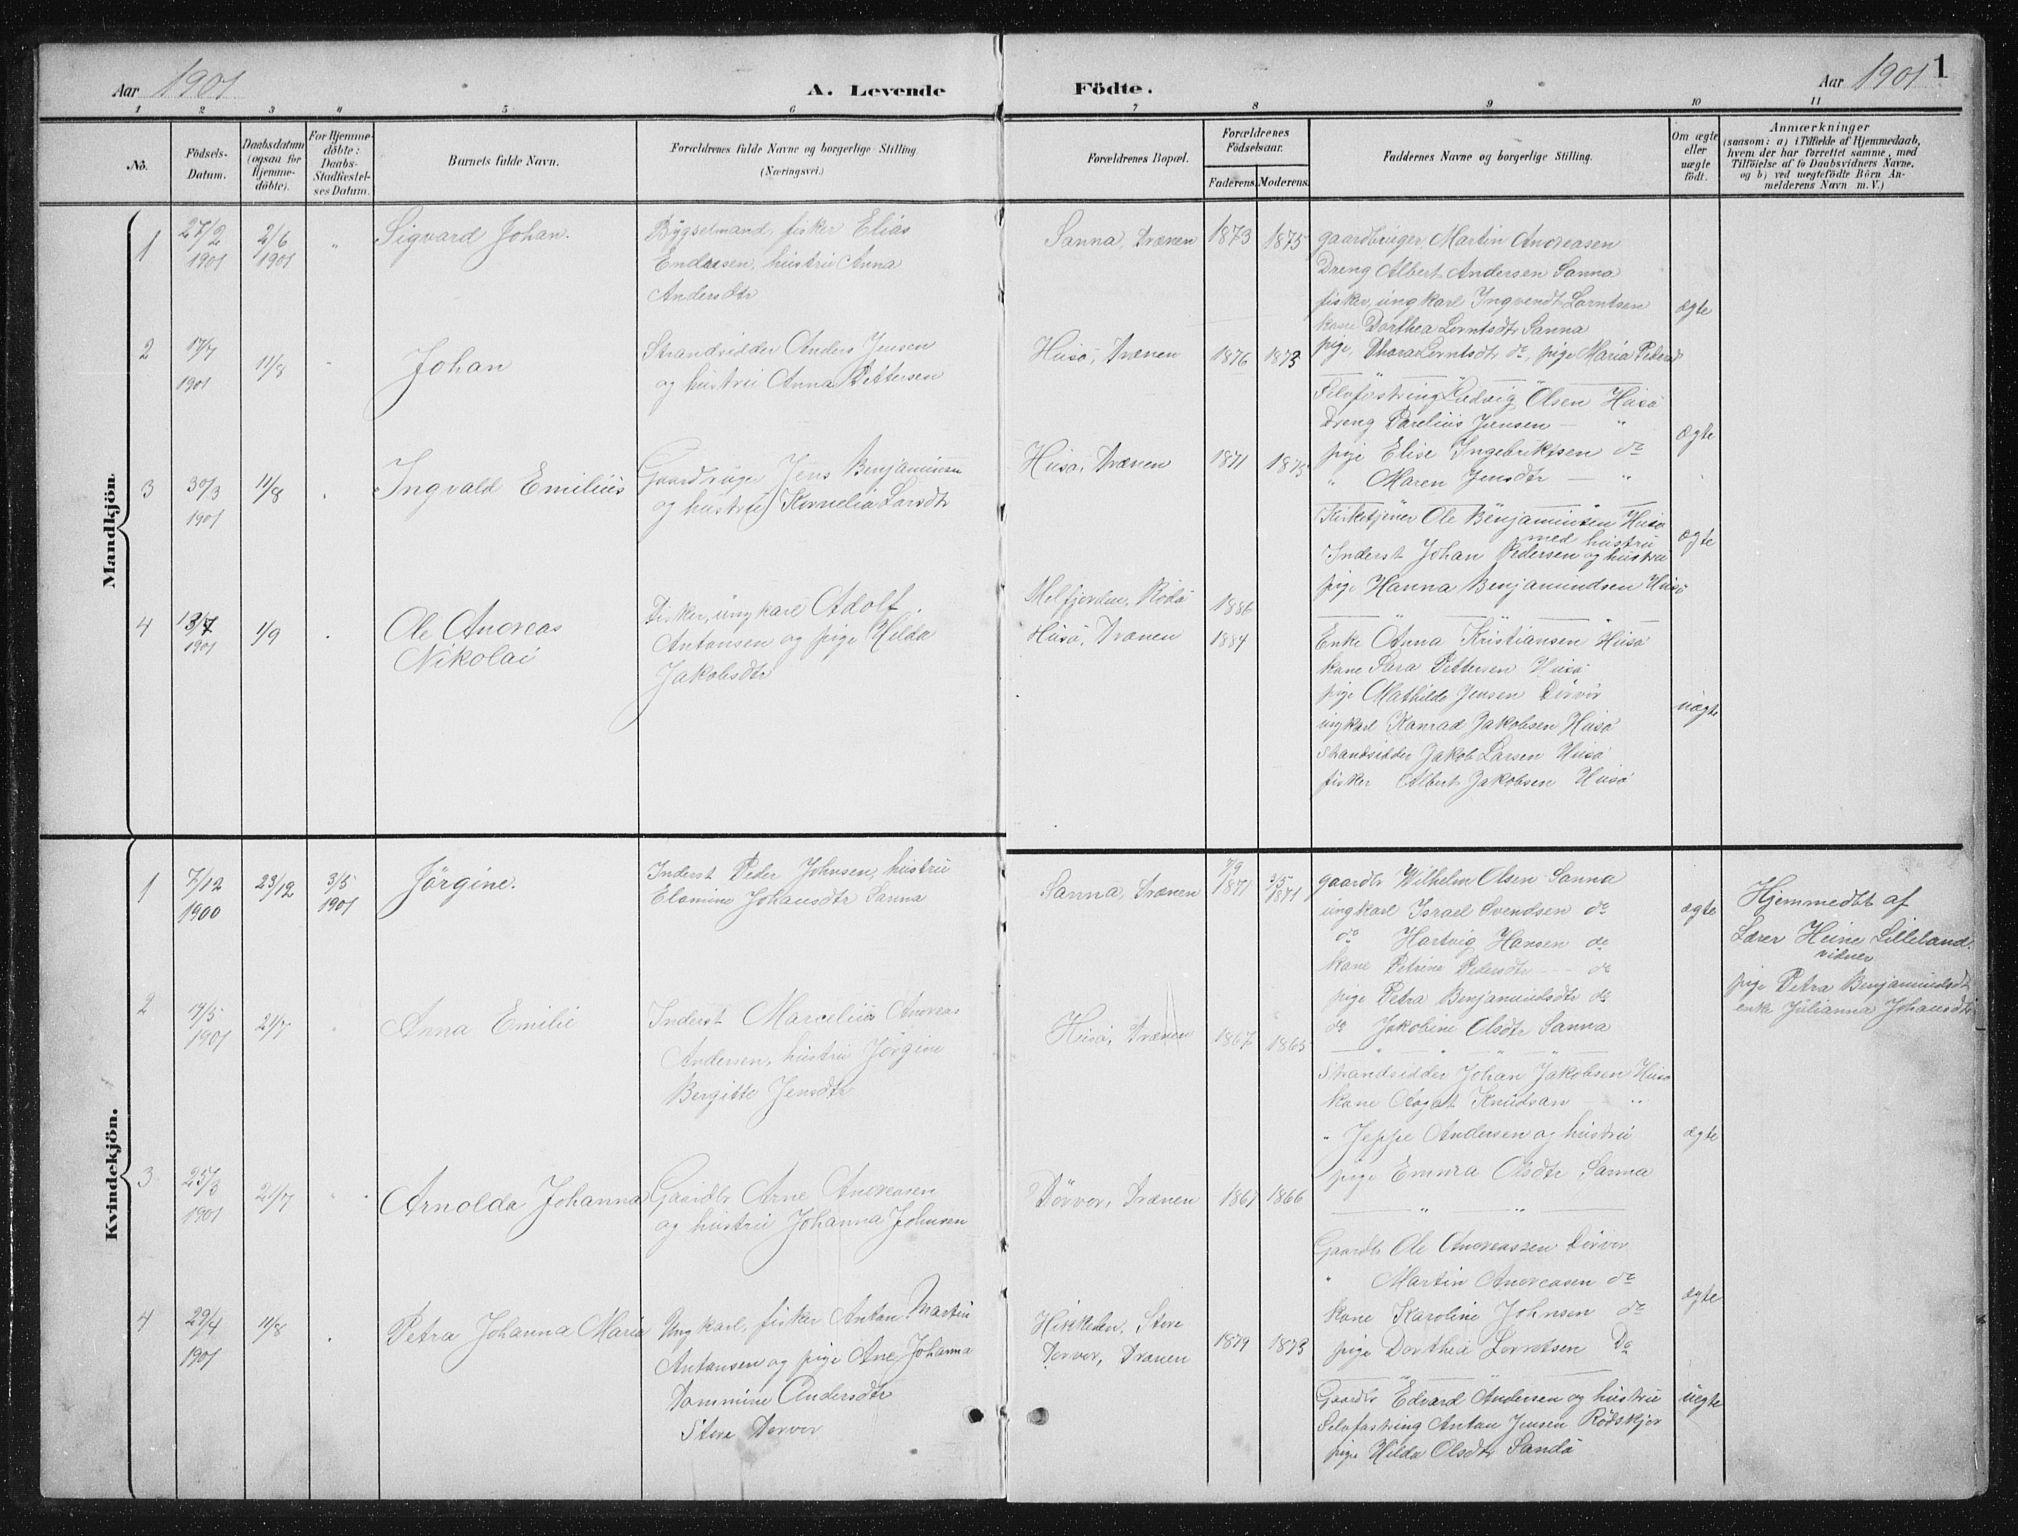 SAT, Ministerialprotokoller, klokkerbøker og fødselsregistre - Nordland, 840/L0583: Klokkerbok nr. 840C03, 1901-1933, s. 1